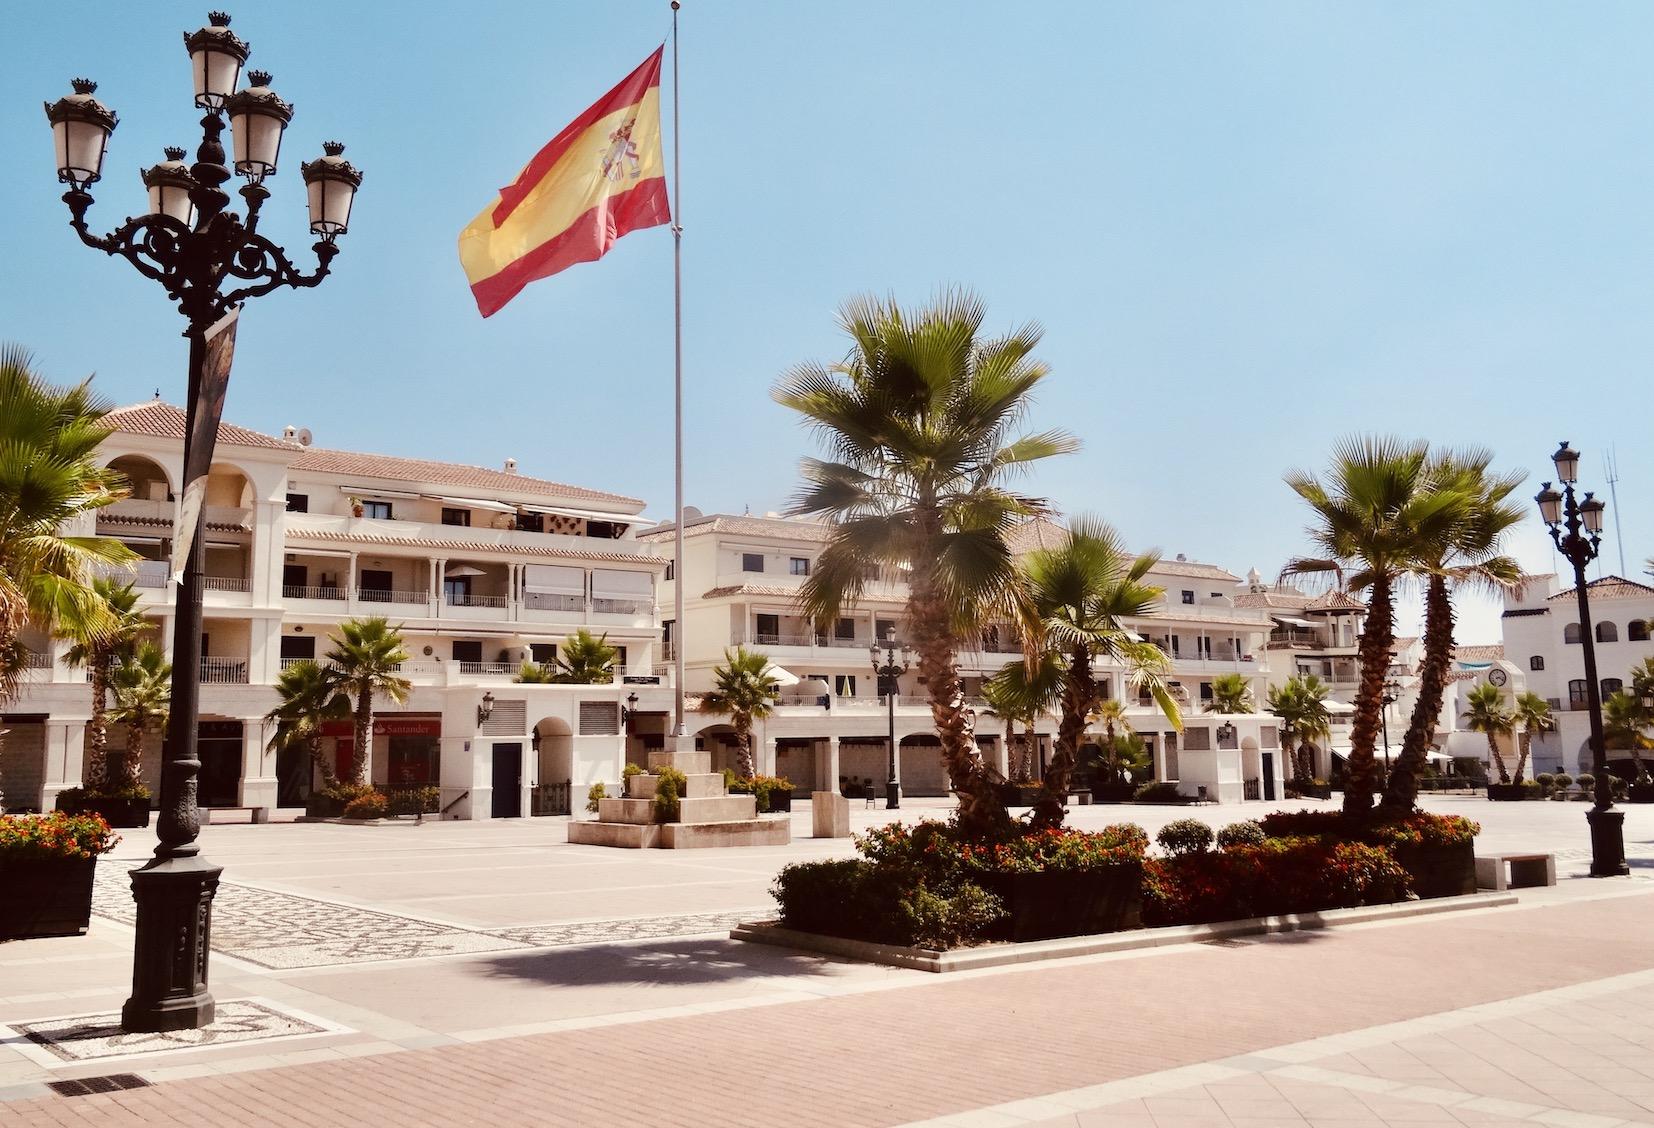 Plaza de Espana Nerja.